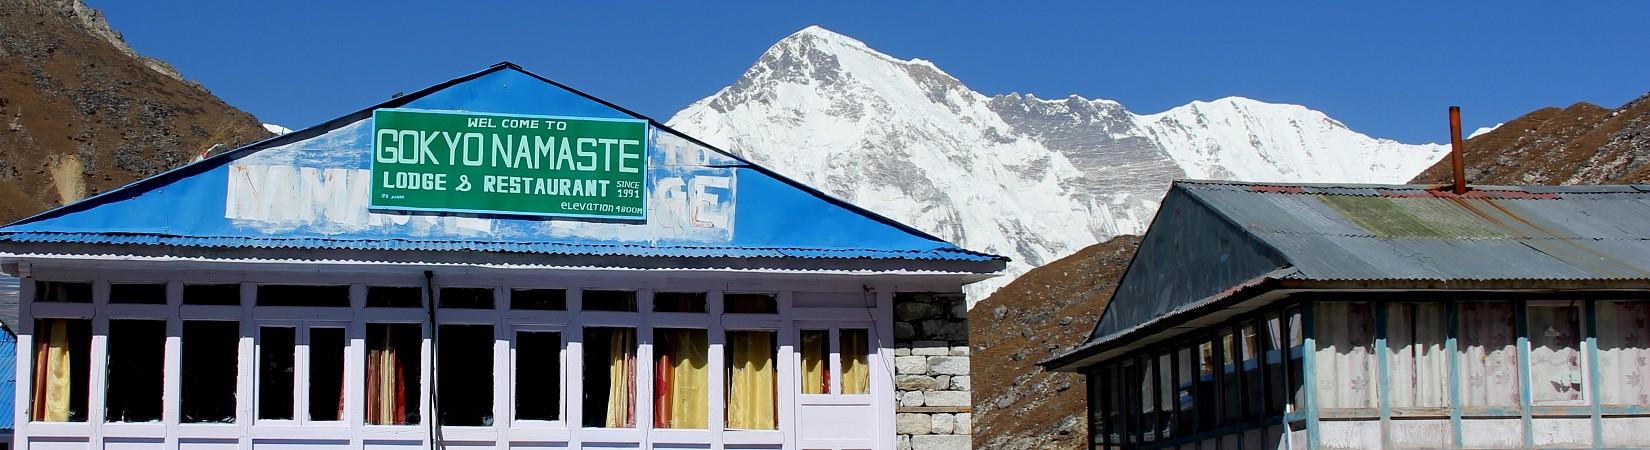 Trek de Lodge en lodge à l'Himalaya